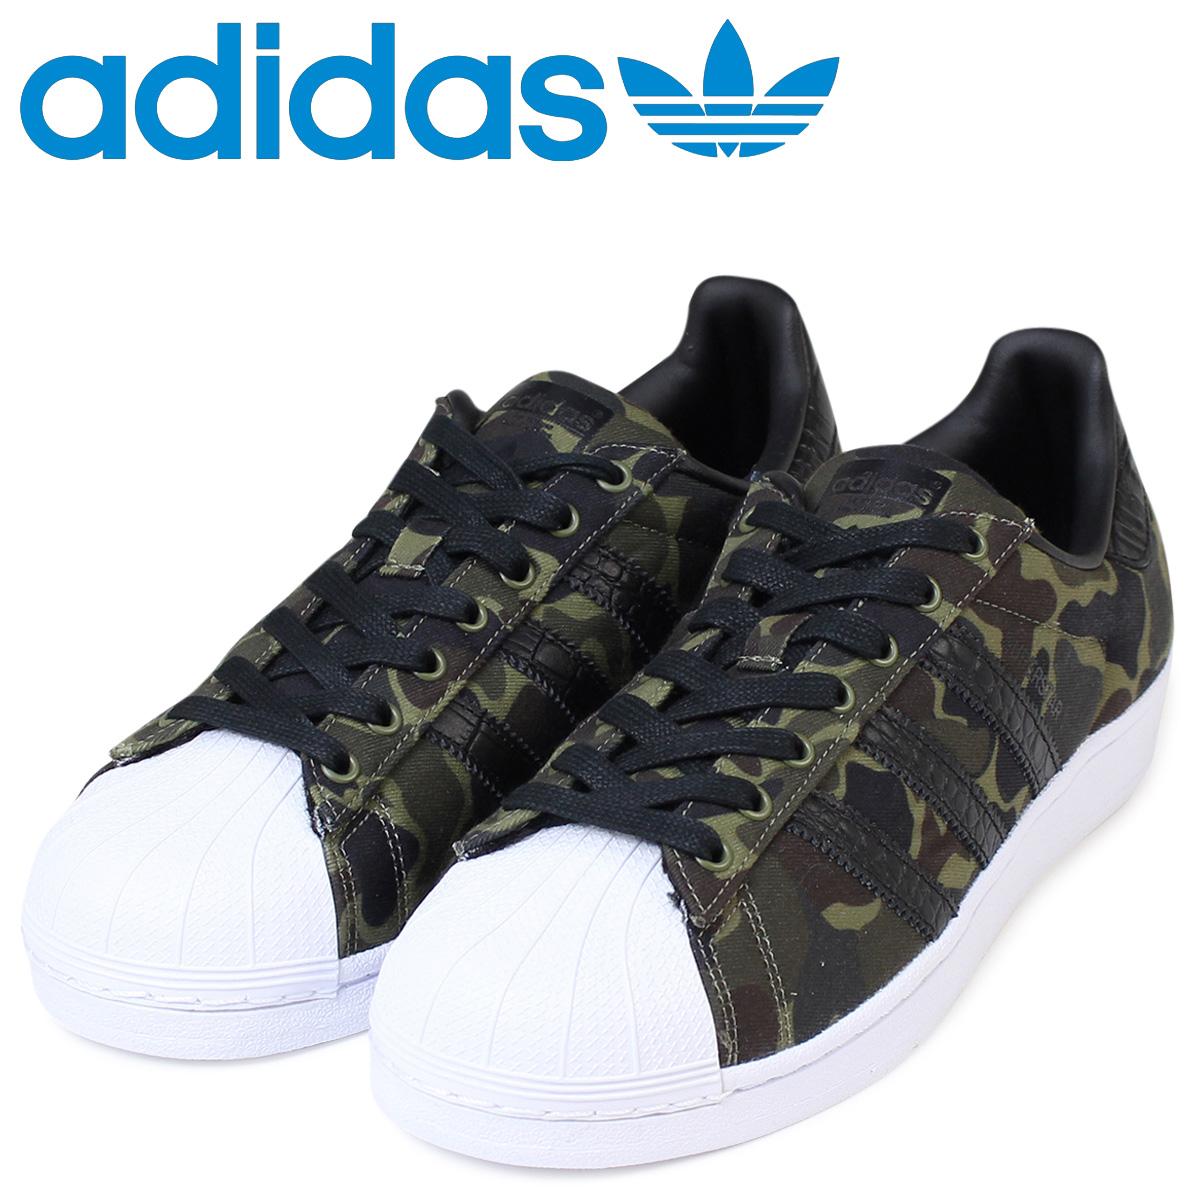 pretty nice 3fc68 f4b54 Adidas superstar sneakers adidas originals men SUPERSTAR BB2774 shoes black  [1/17 Shinnyu load]